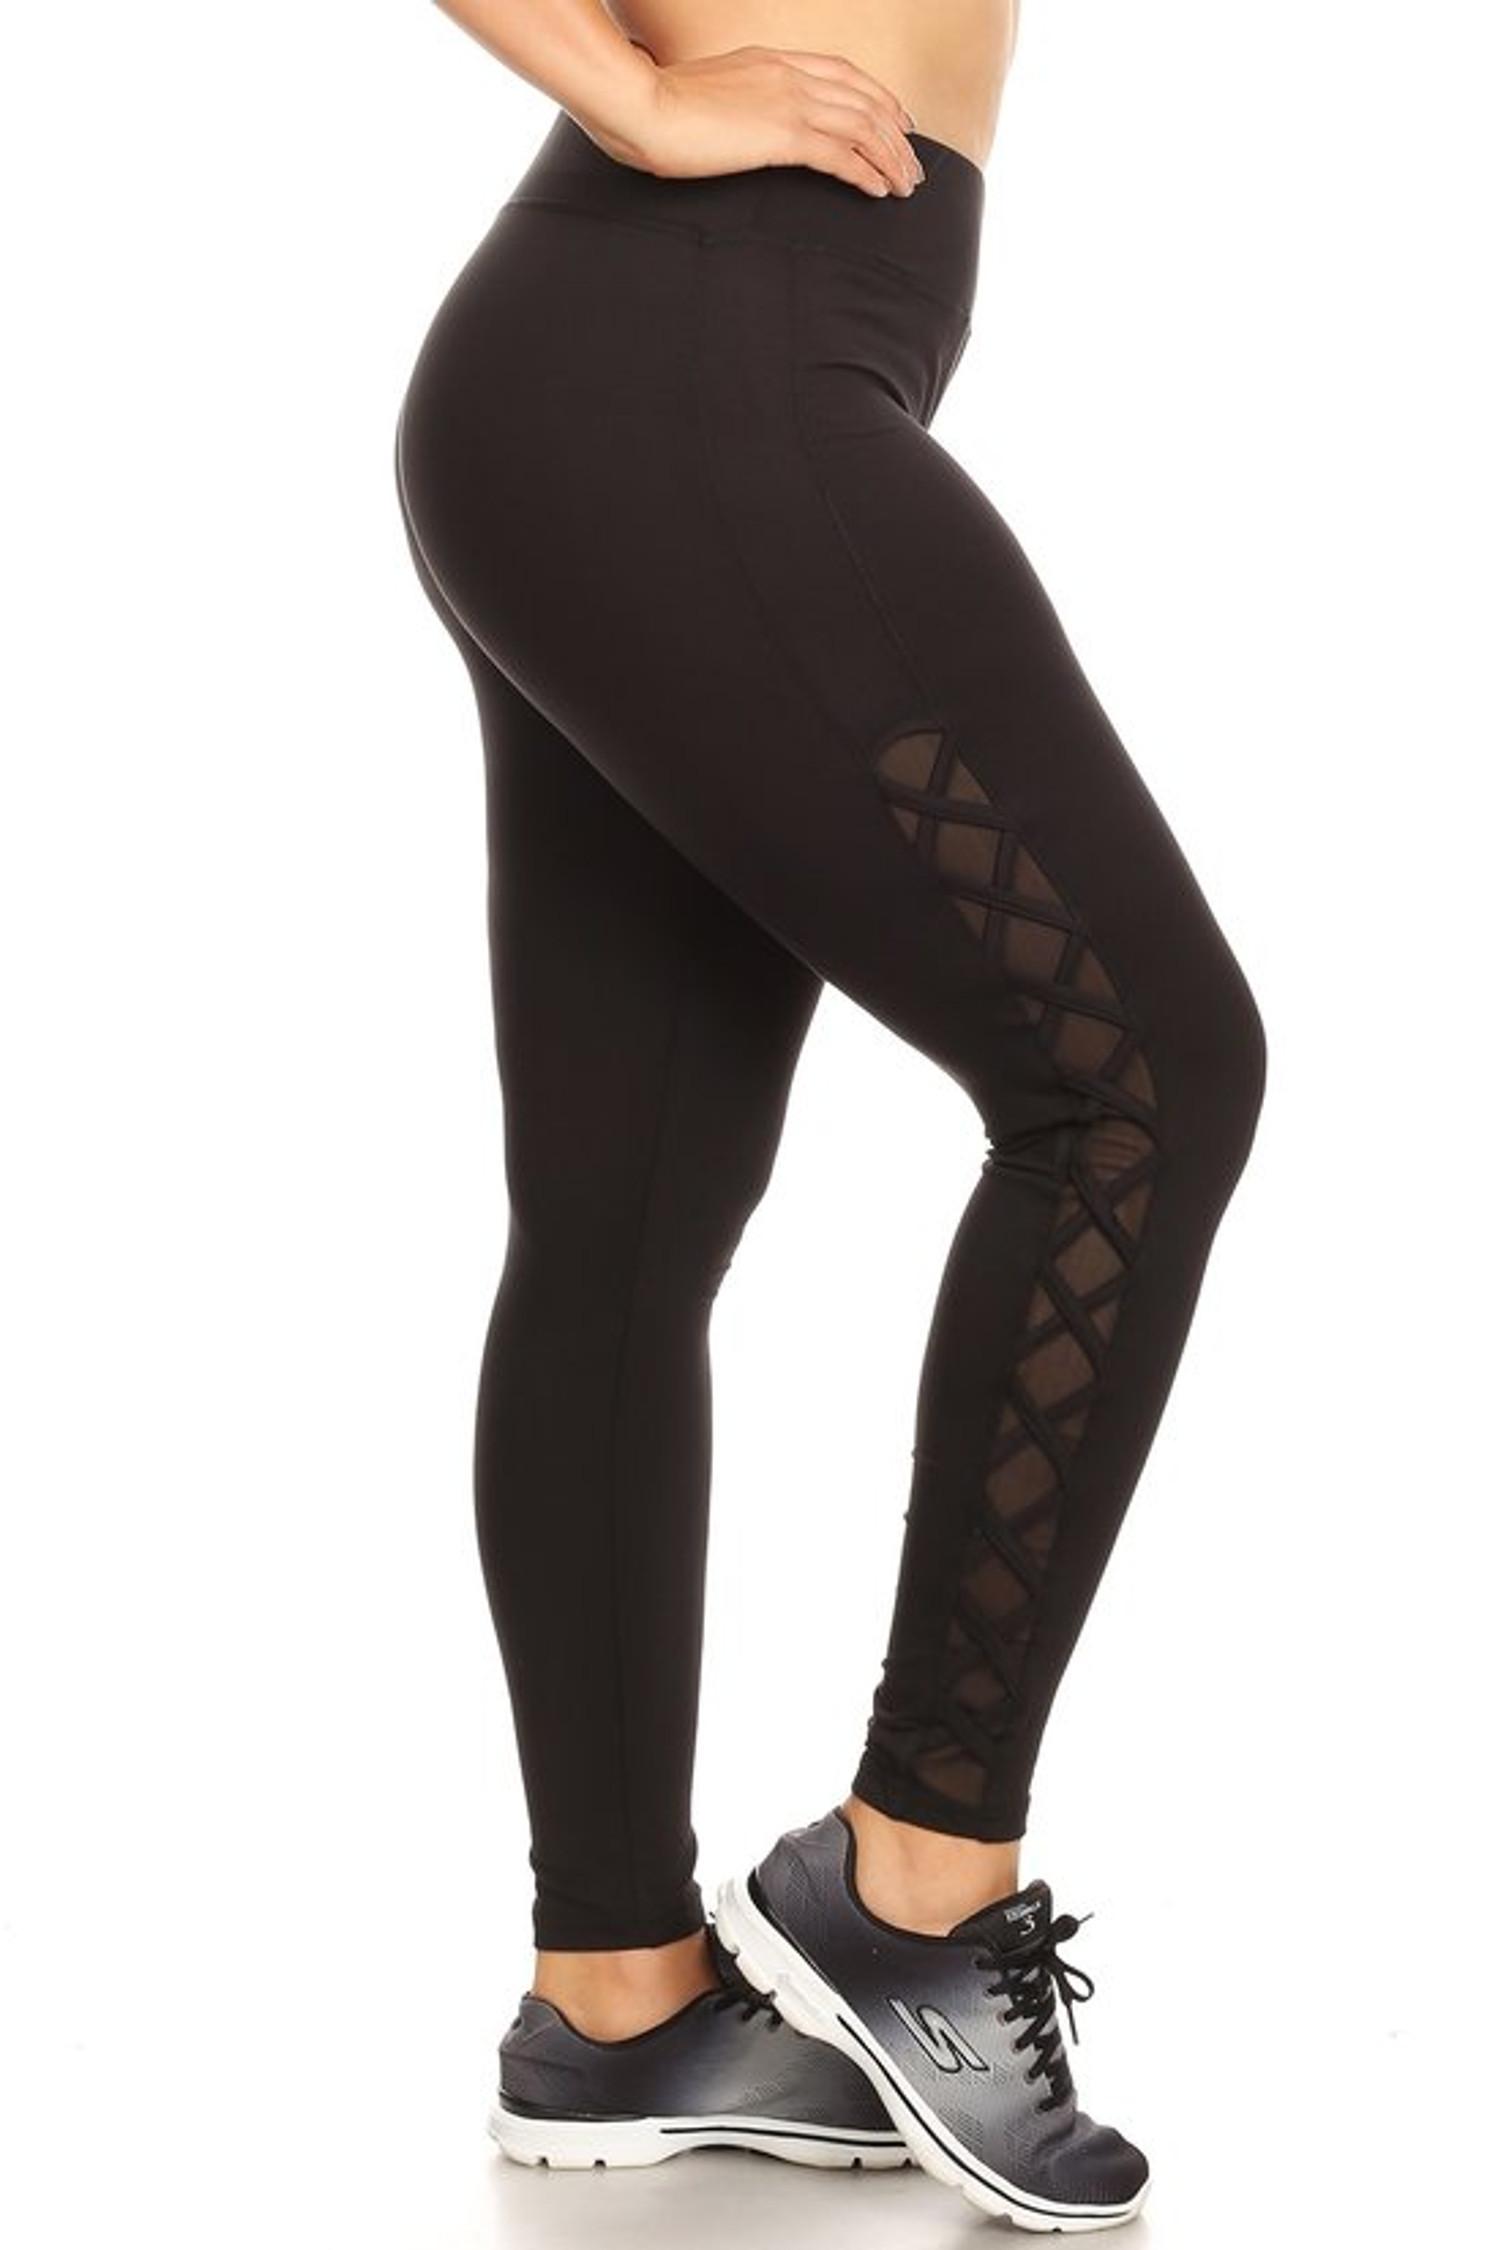 Side Crisscross Mesh Sport Plus Size Leggings